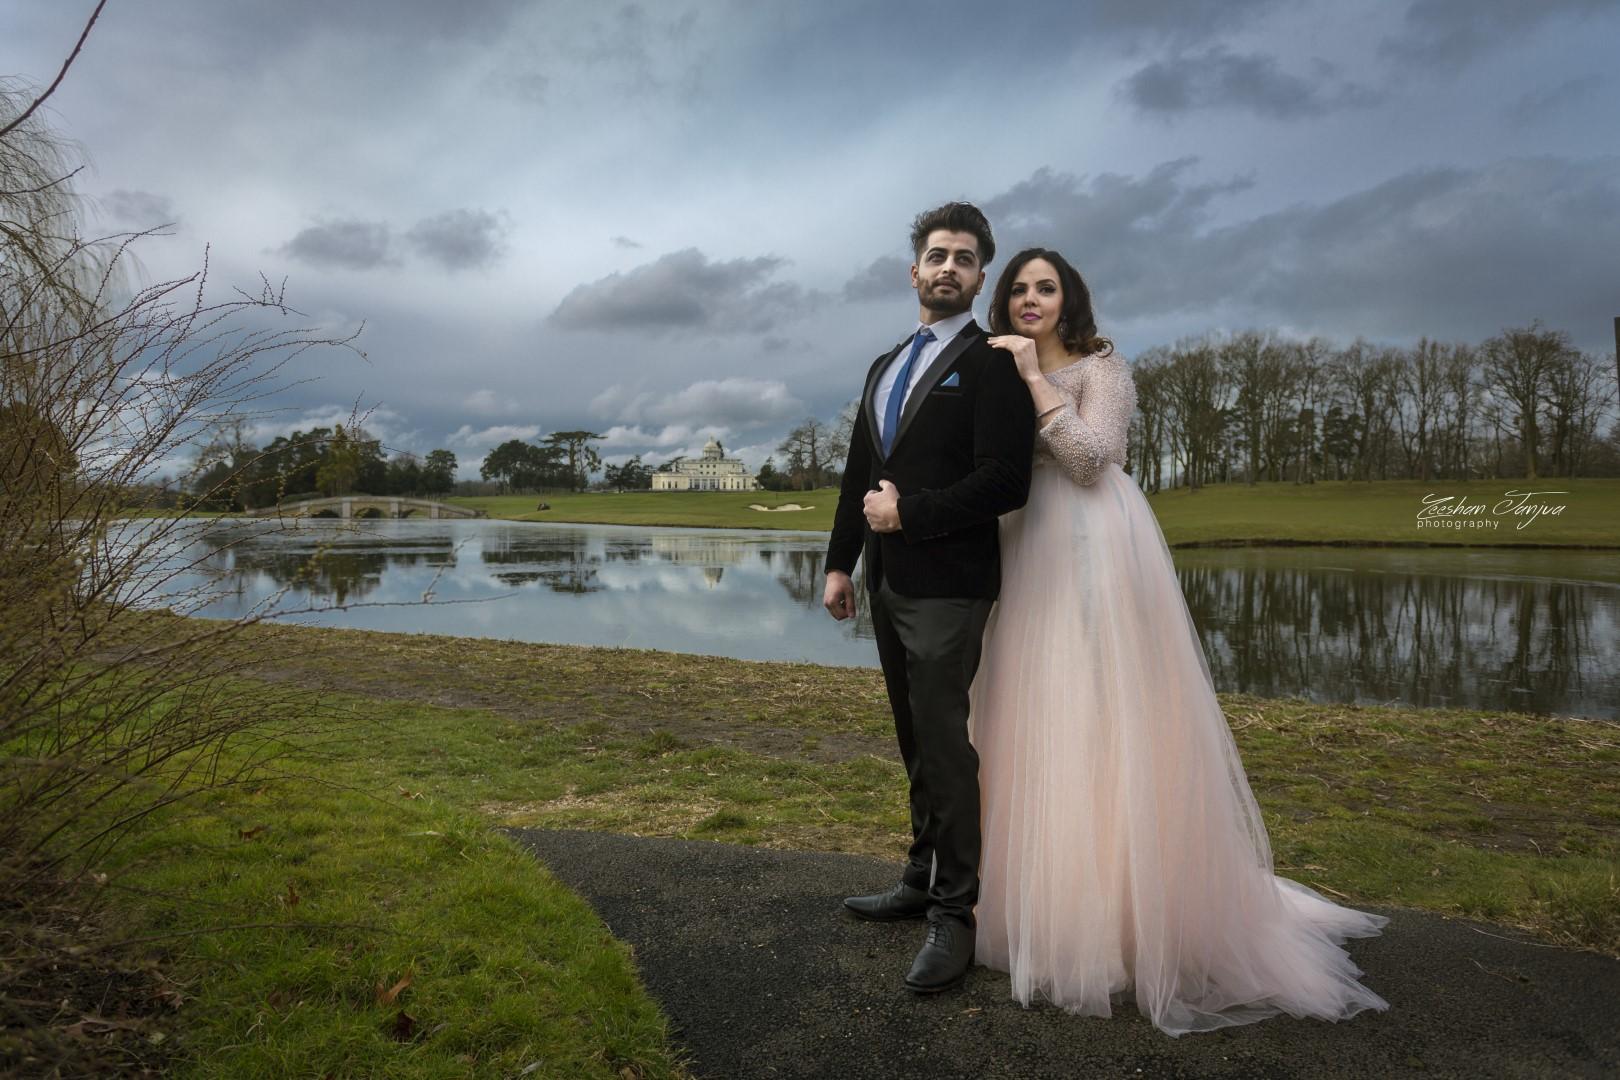 Wedding Photographer in Harrow